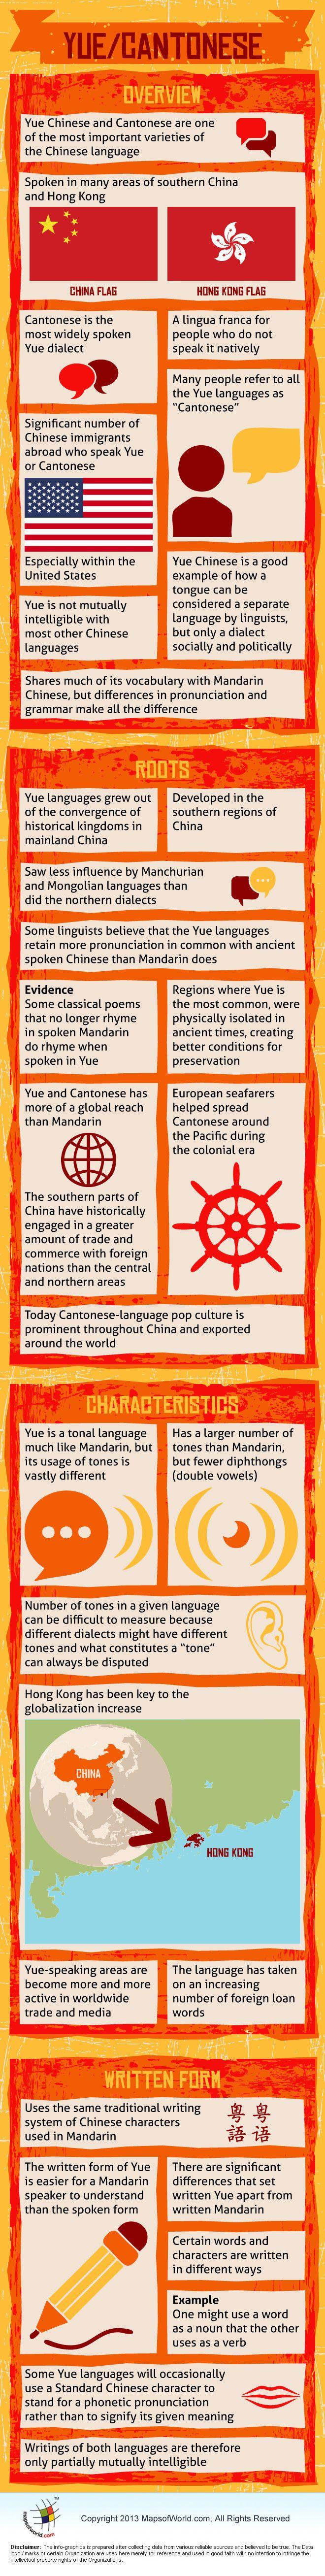 Cantonese vs Mandarin in Guangzhou |外国人网| eChinacities.com